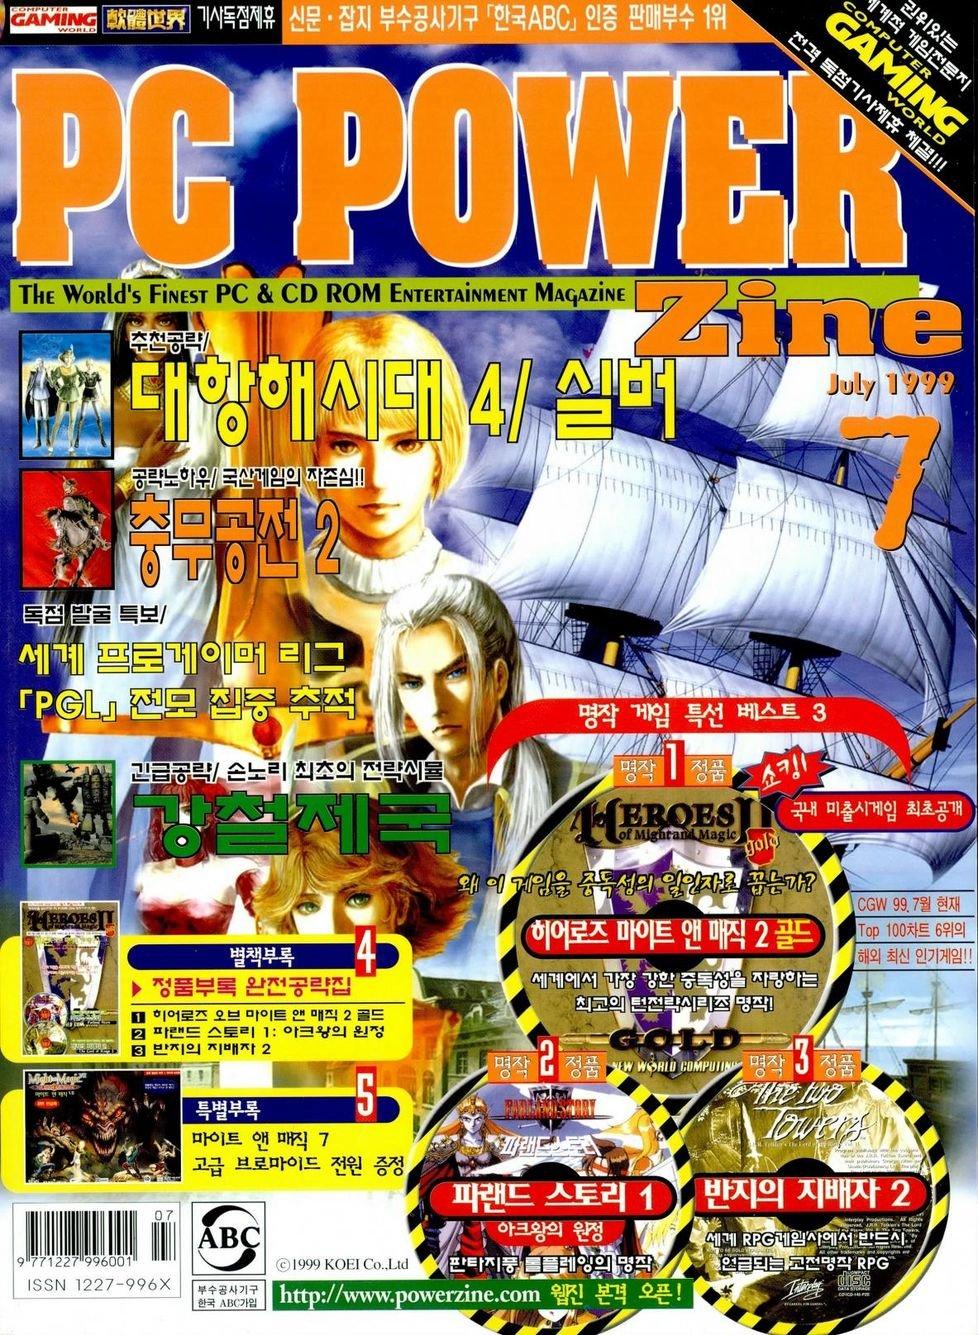 PC Power Zine Issue 48 (July 1999)